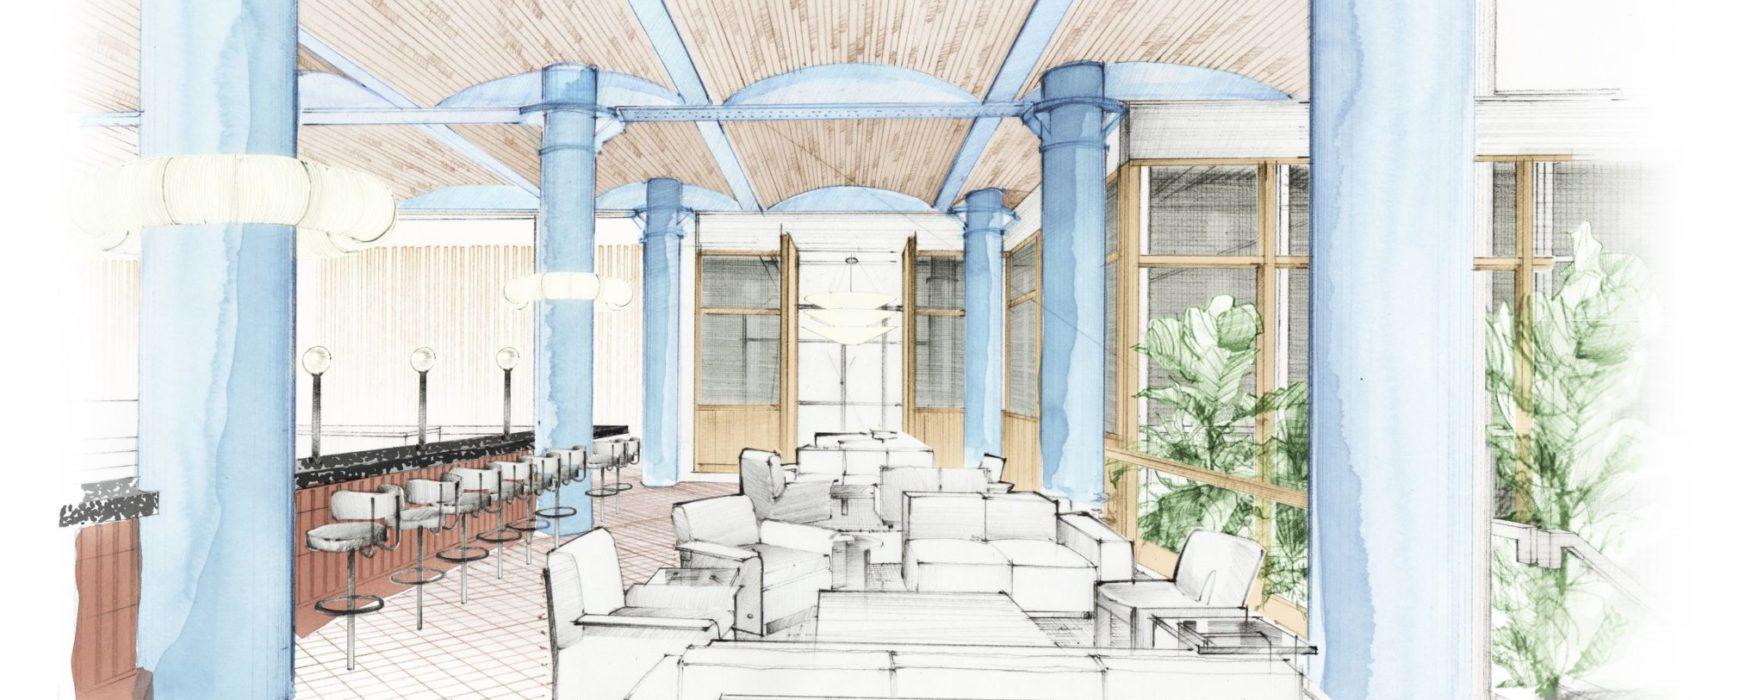 Cultureplex to open in Ducie Street Warehouse